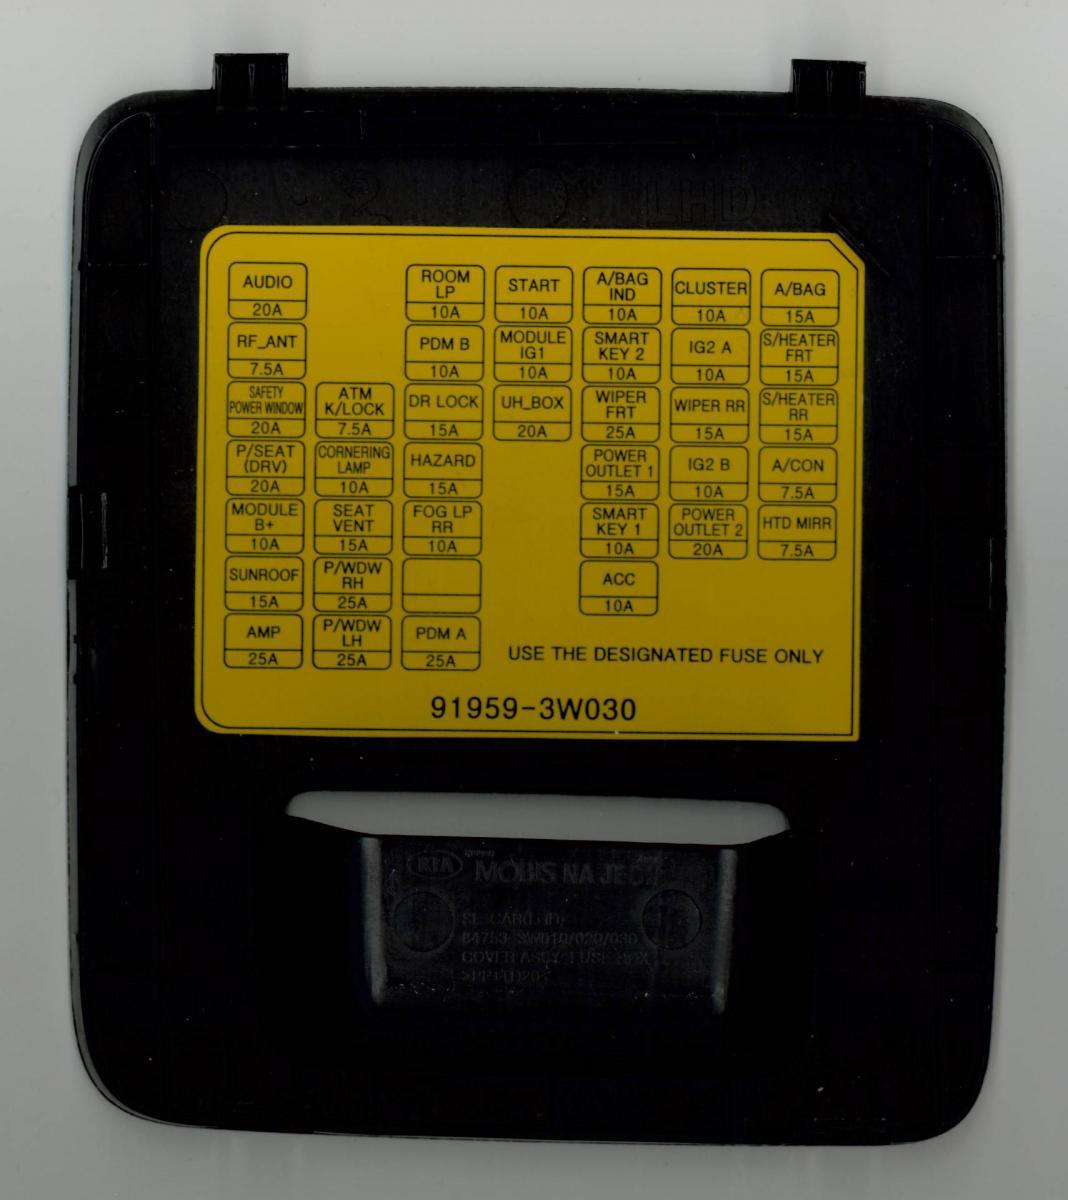 2005 kia spectra5 stereo wiring diagram vacuum for 1970 chevelle fuse box location  free